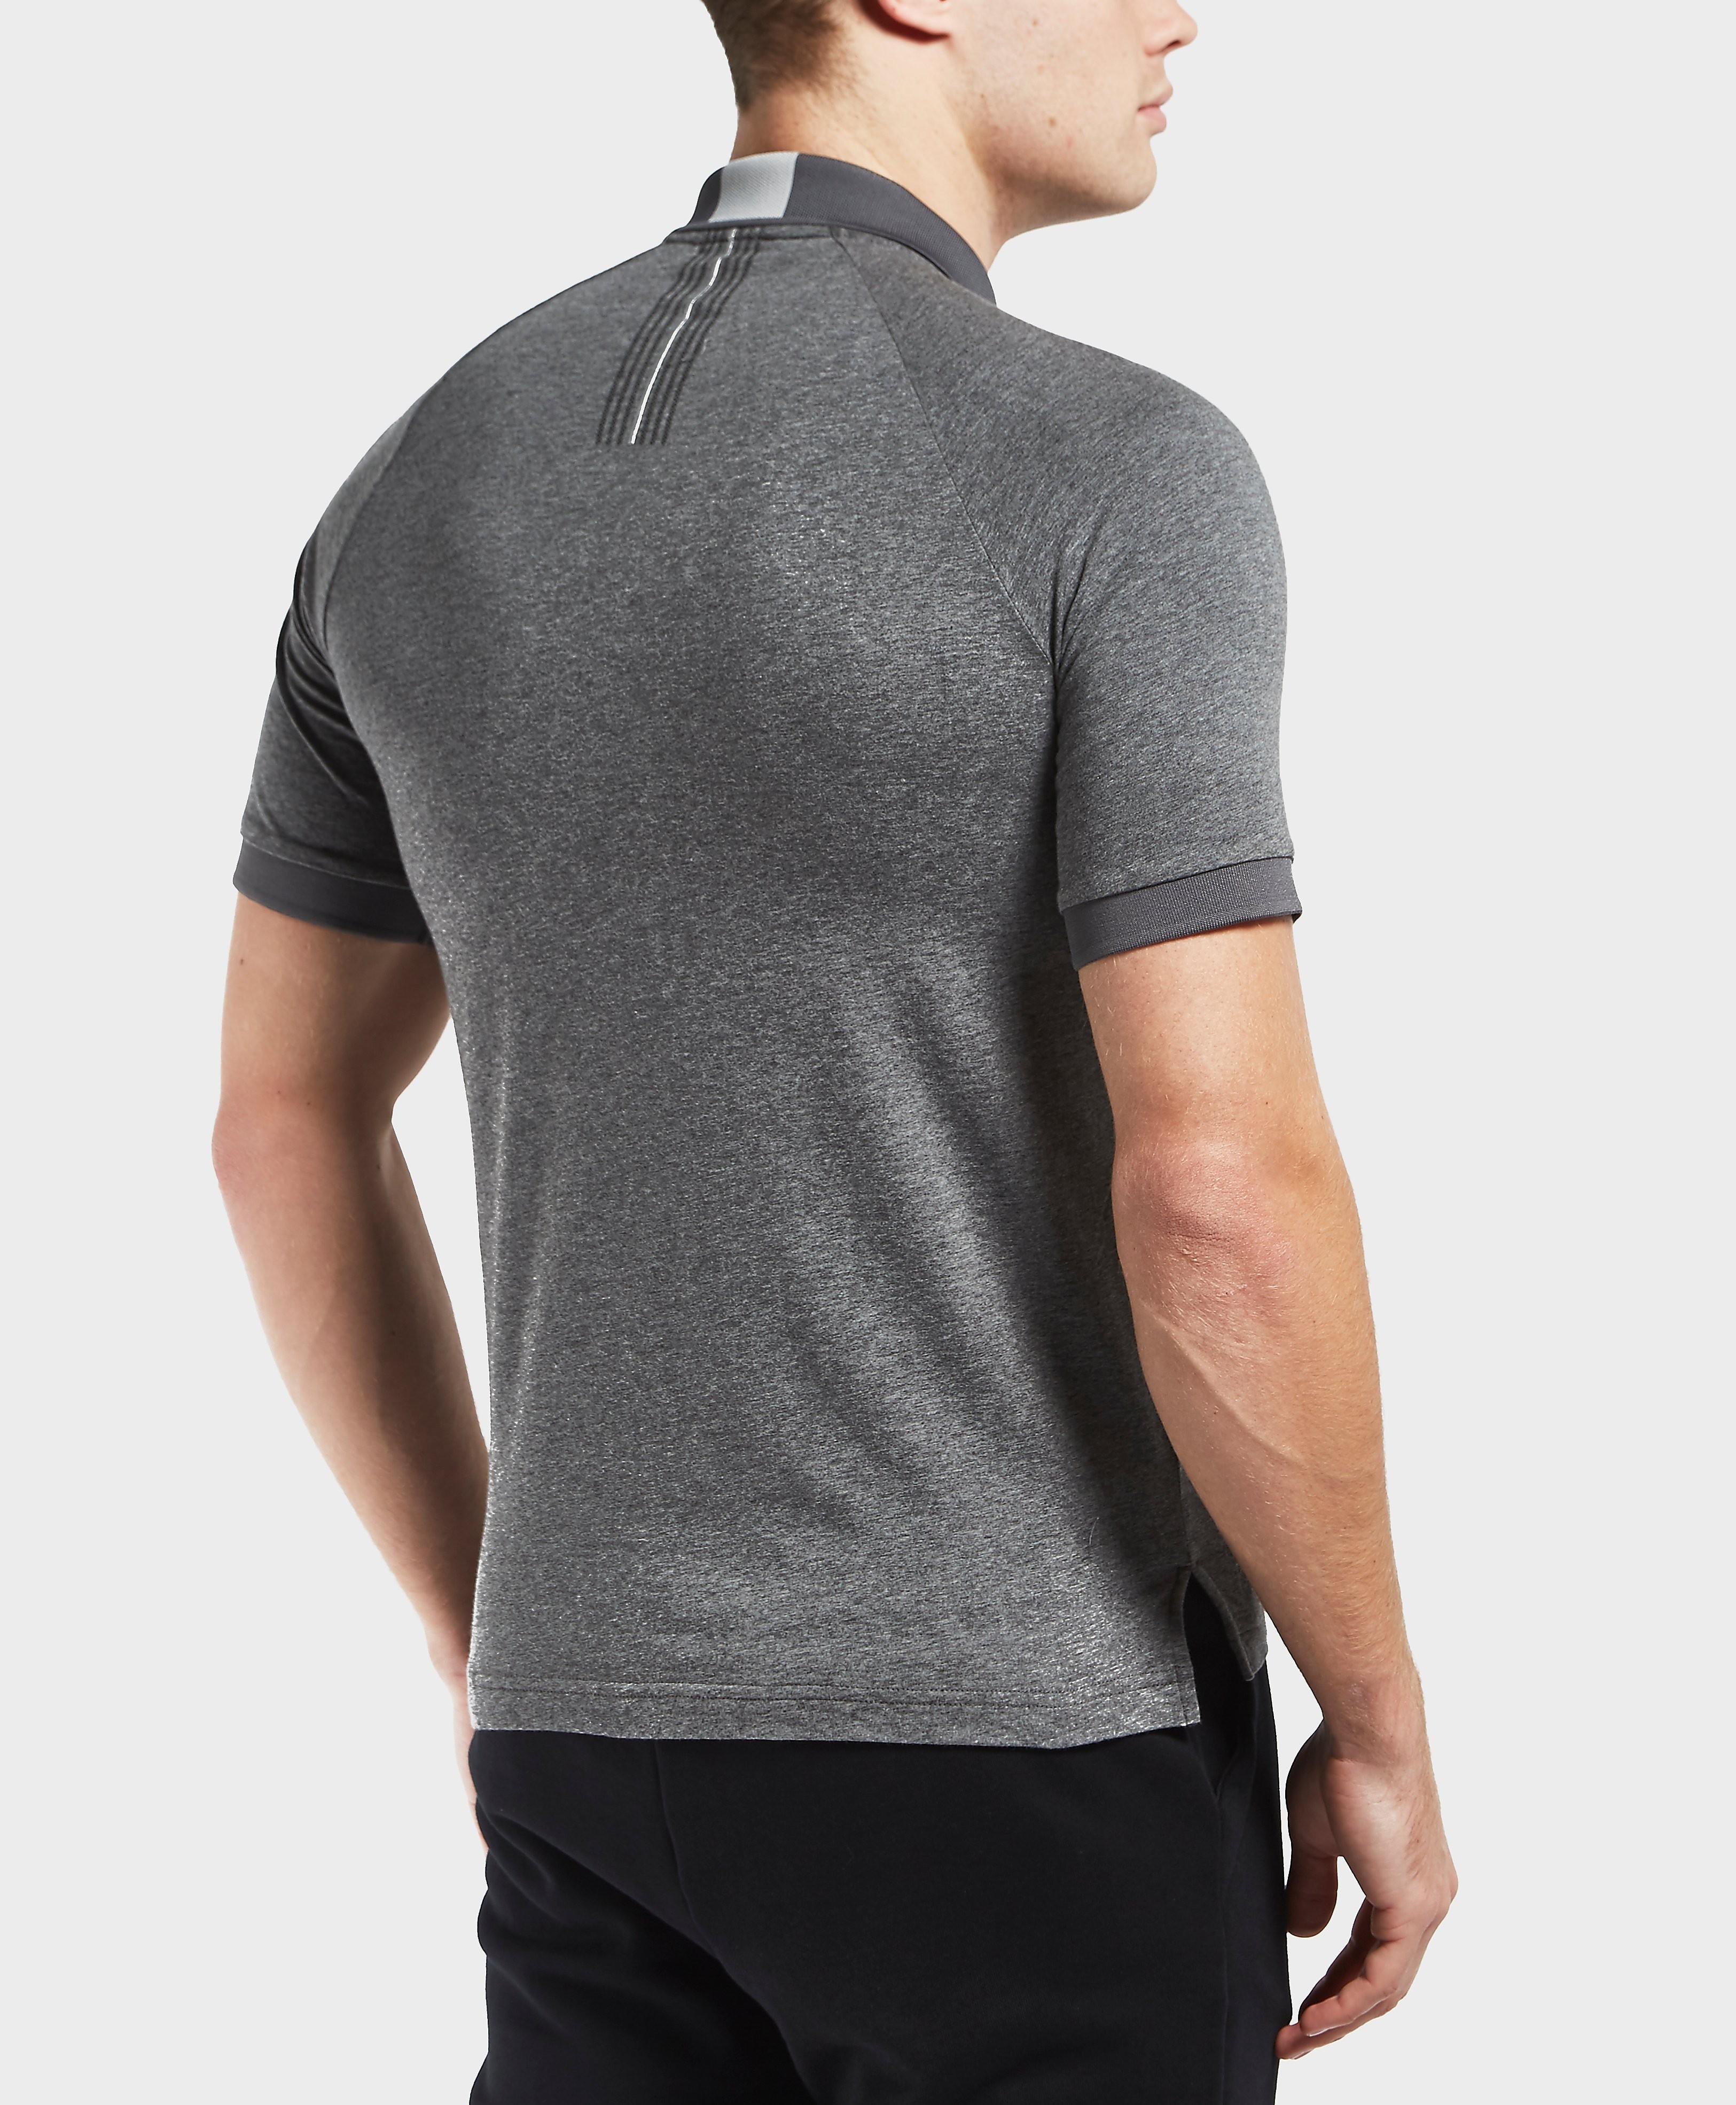 Emporio Armani EA7 Train Evo Short Sleeve Polo Shirt